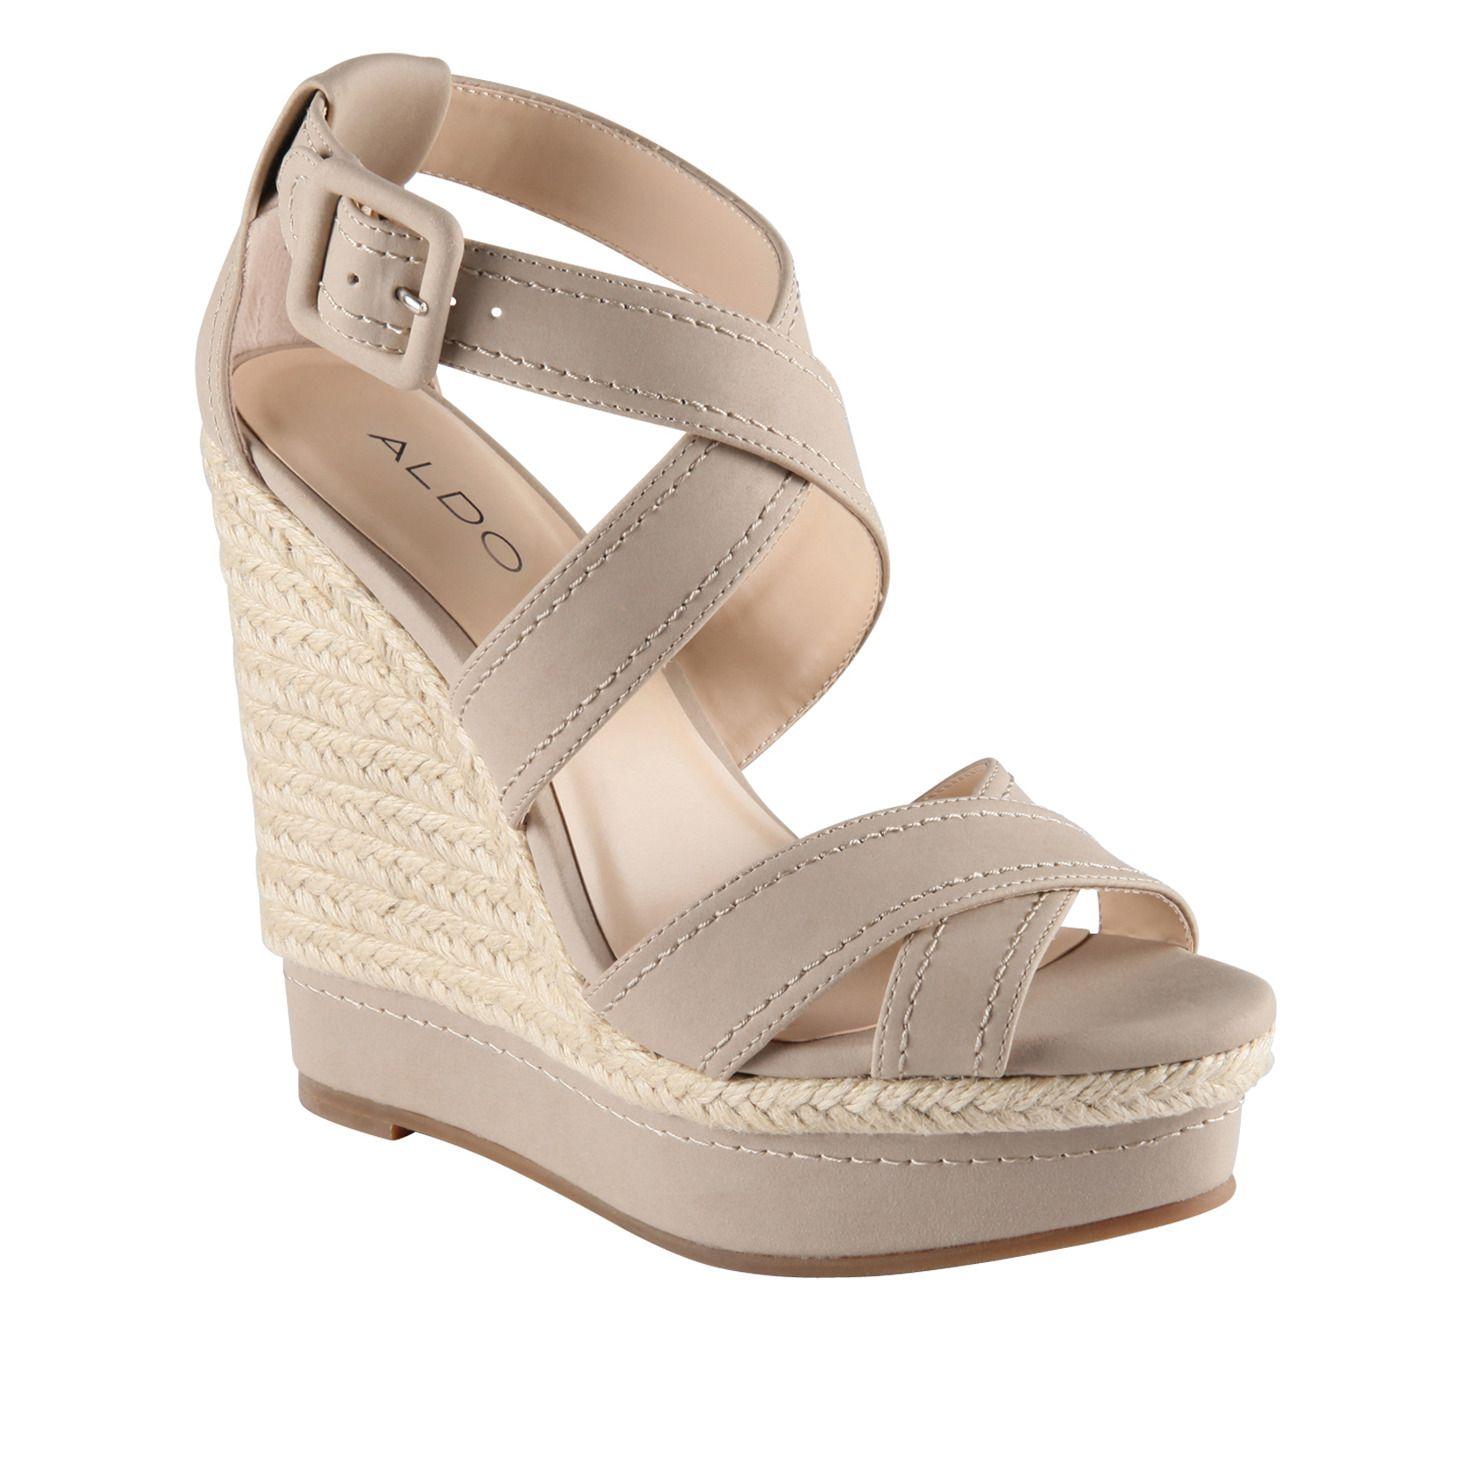 9eda989722e4 Aldo Women s Ferralla Wedge Sandal